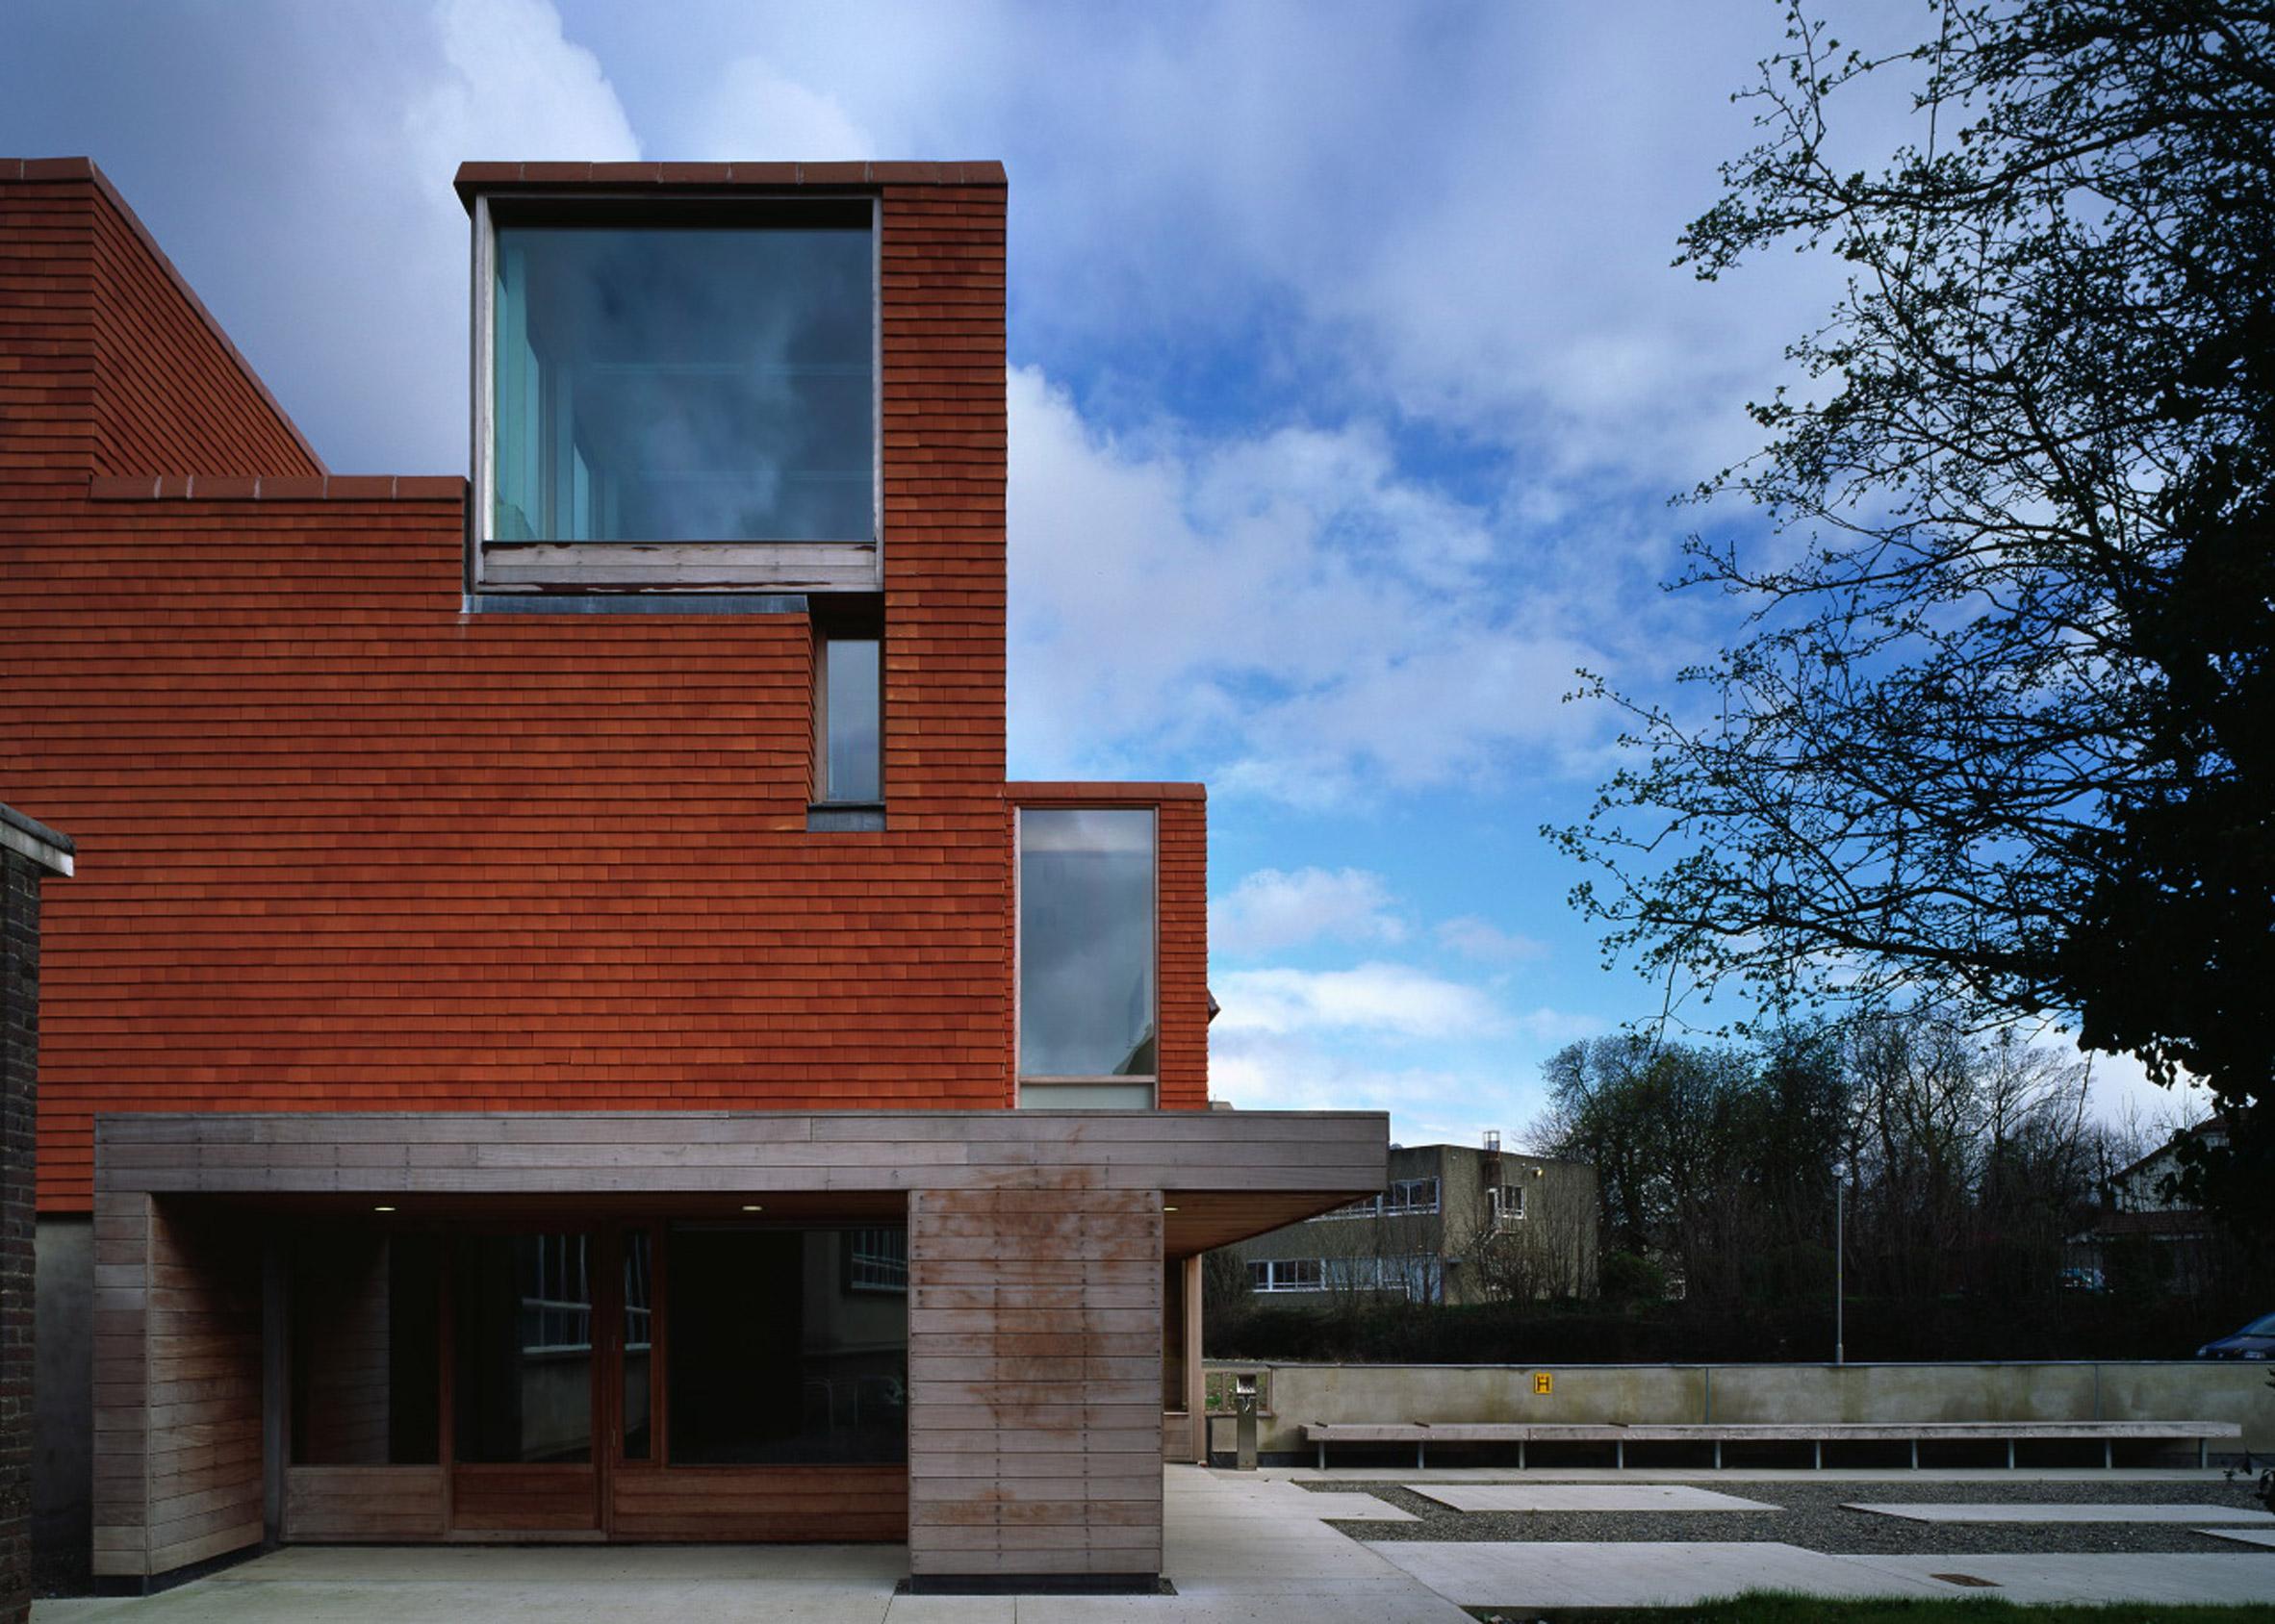 Urban Institute of Ireland; University College Dublin, Ireland, 2002